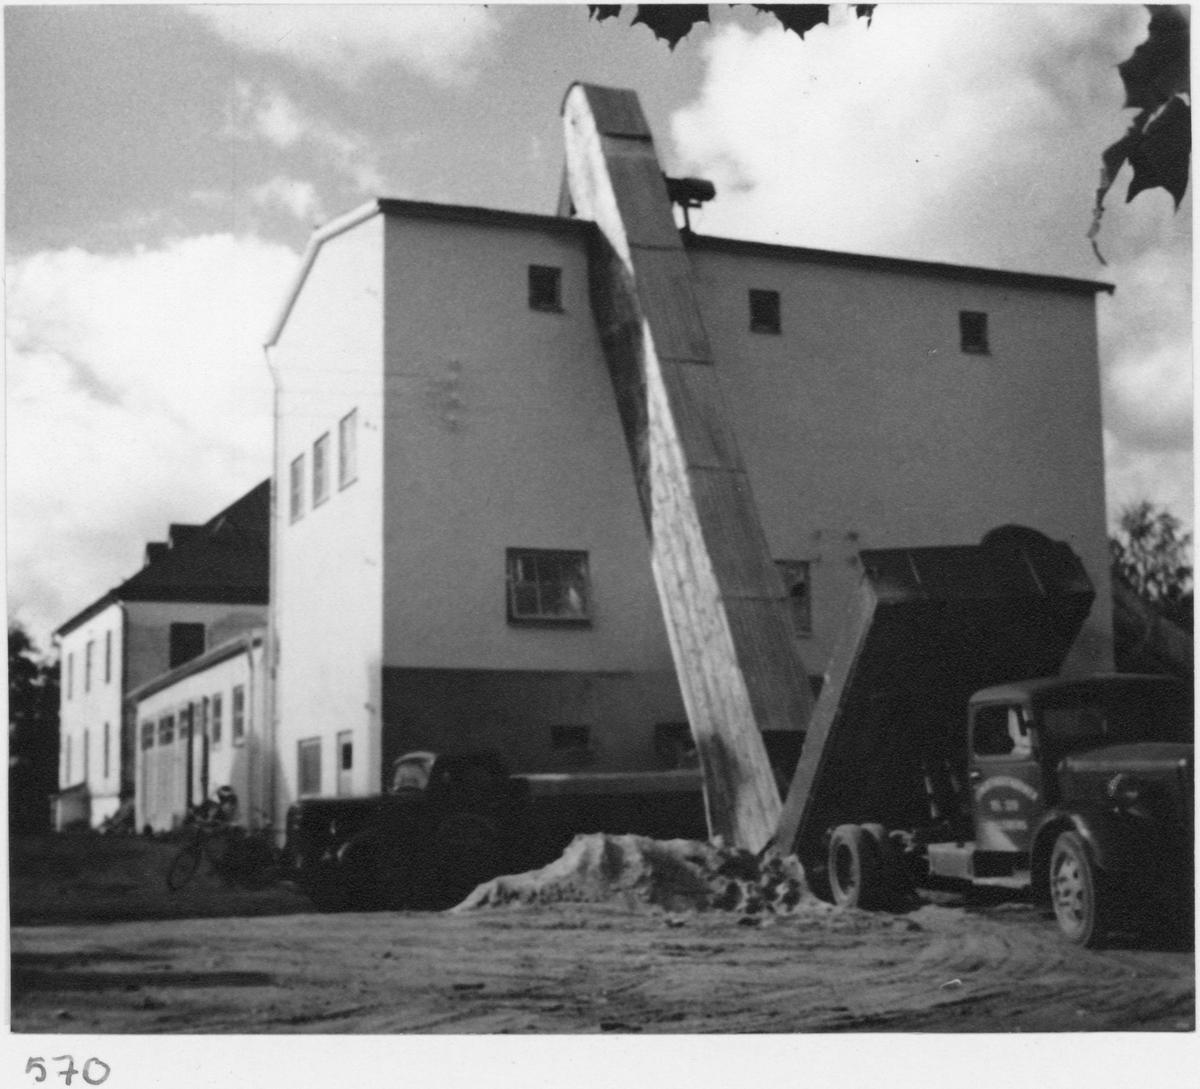 Murbruksfabrik Exteriör